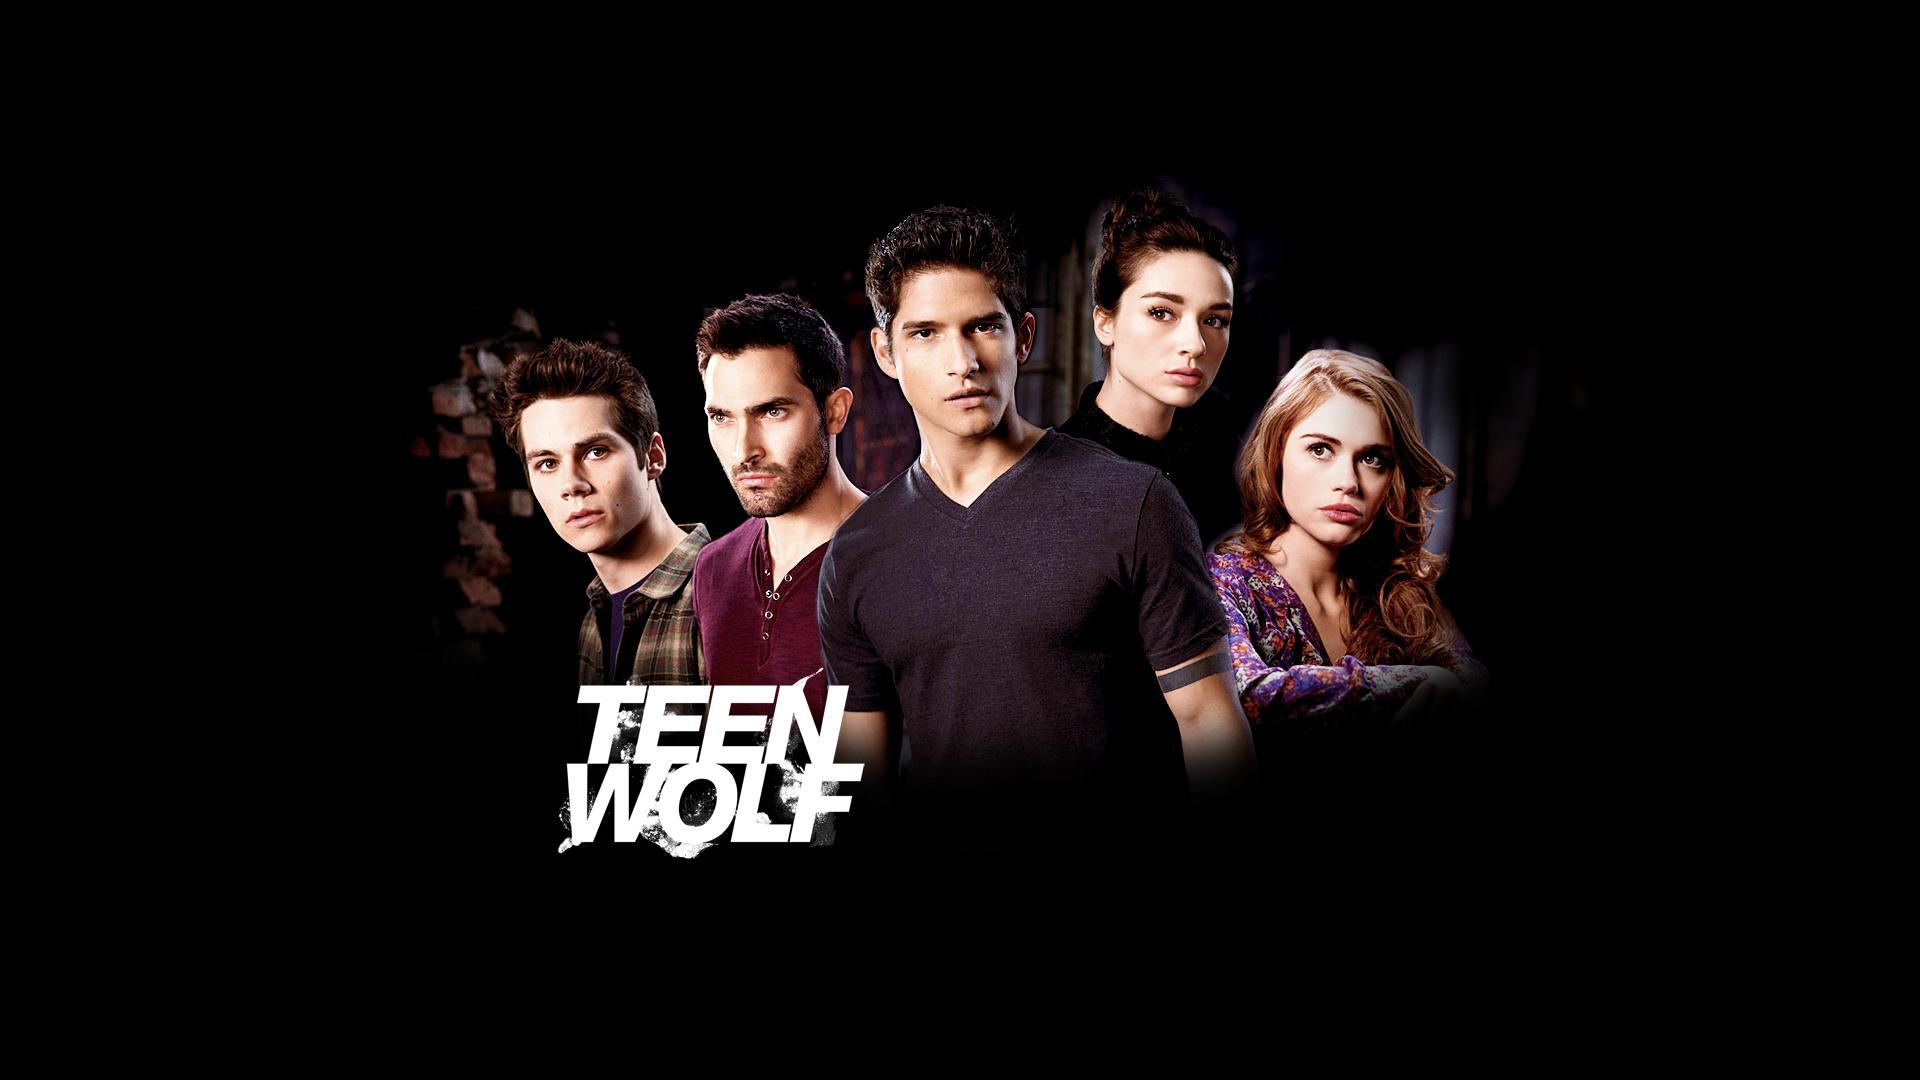 Teen Wolf Wallpaper 2014 on WallpaperSafari